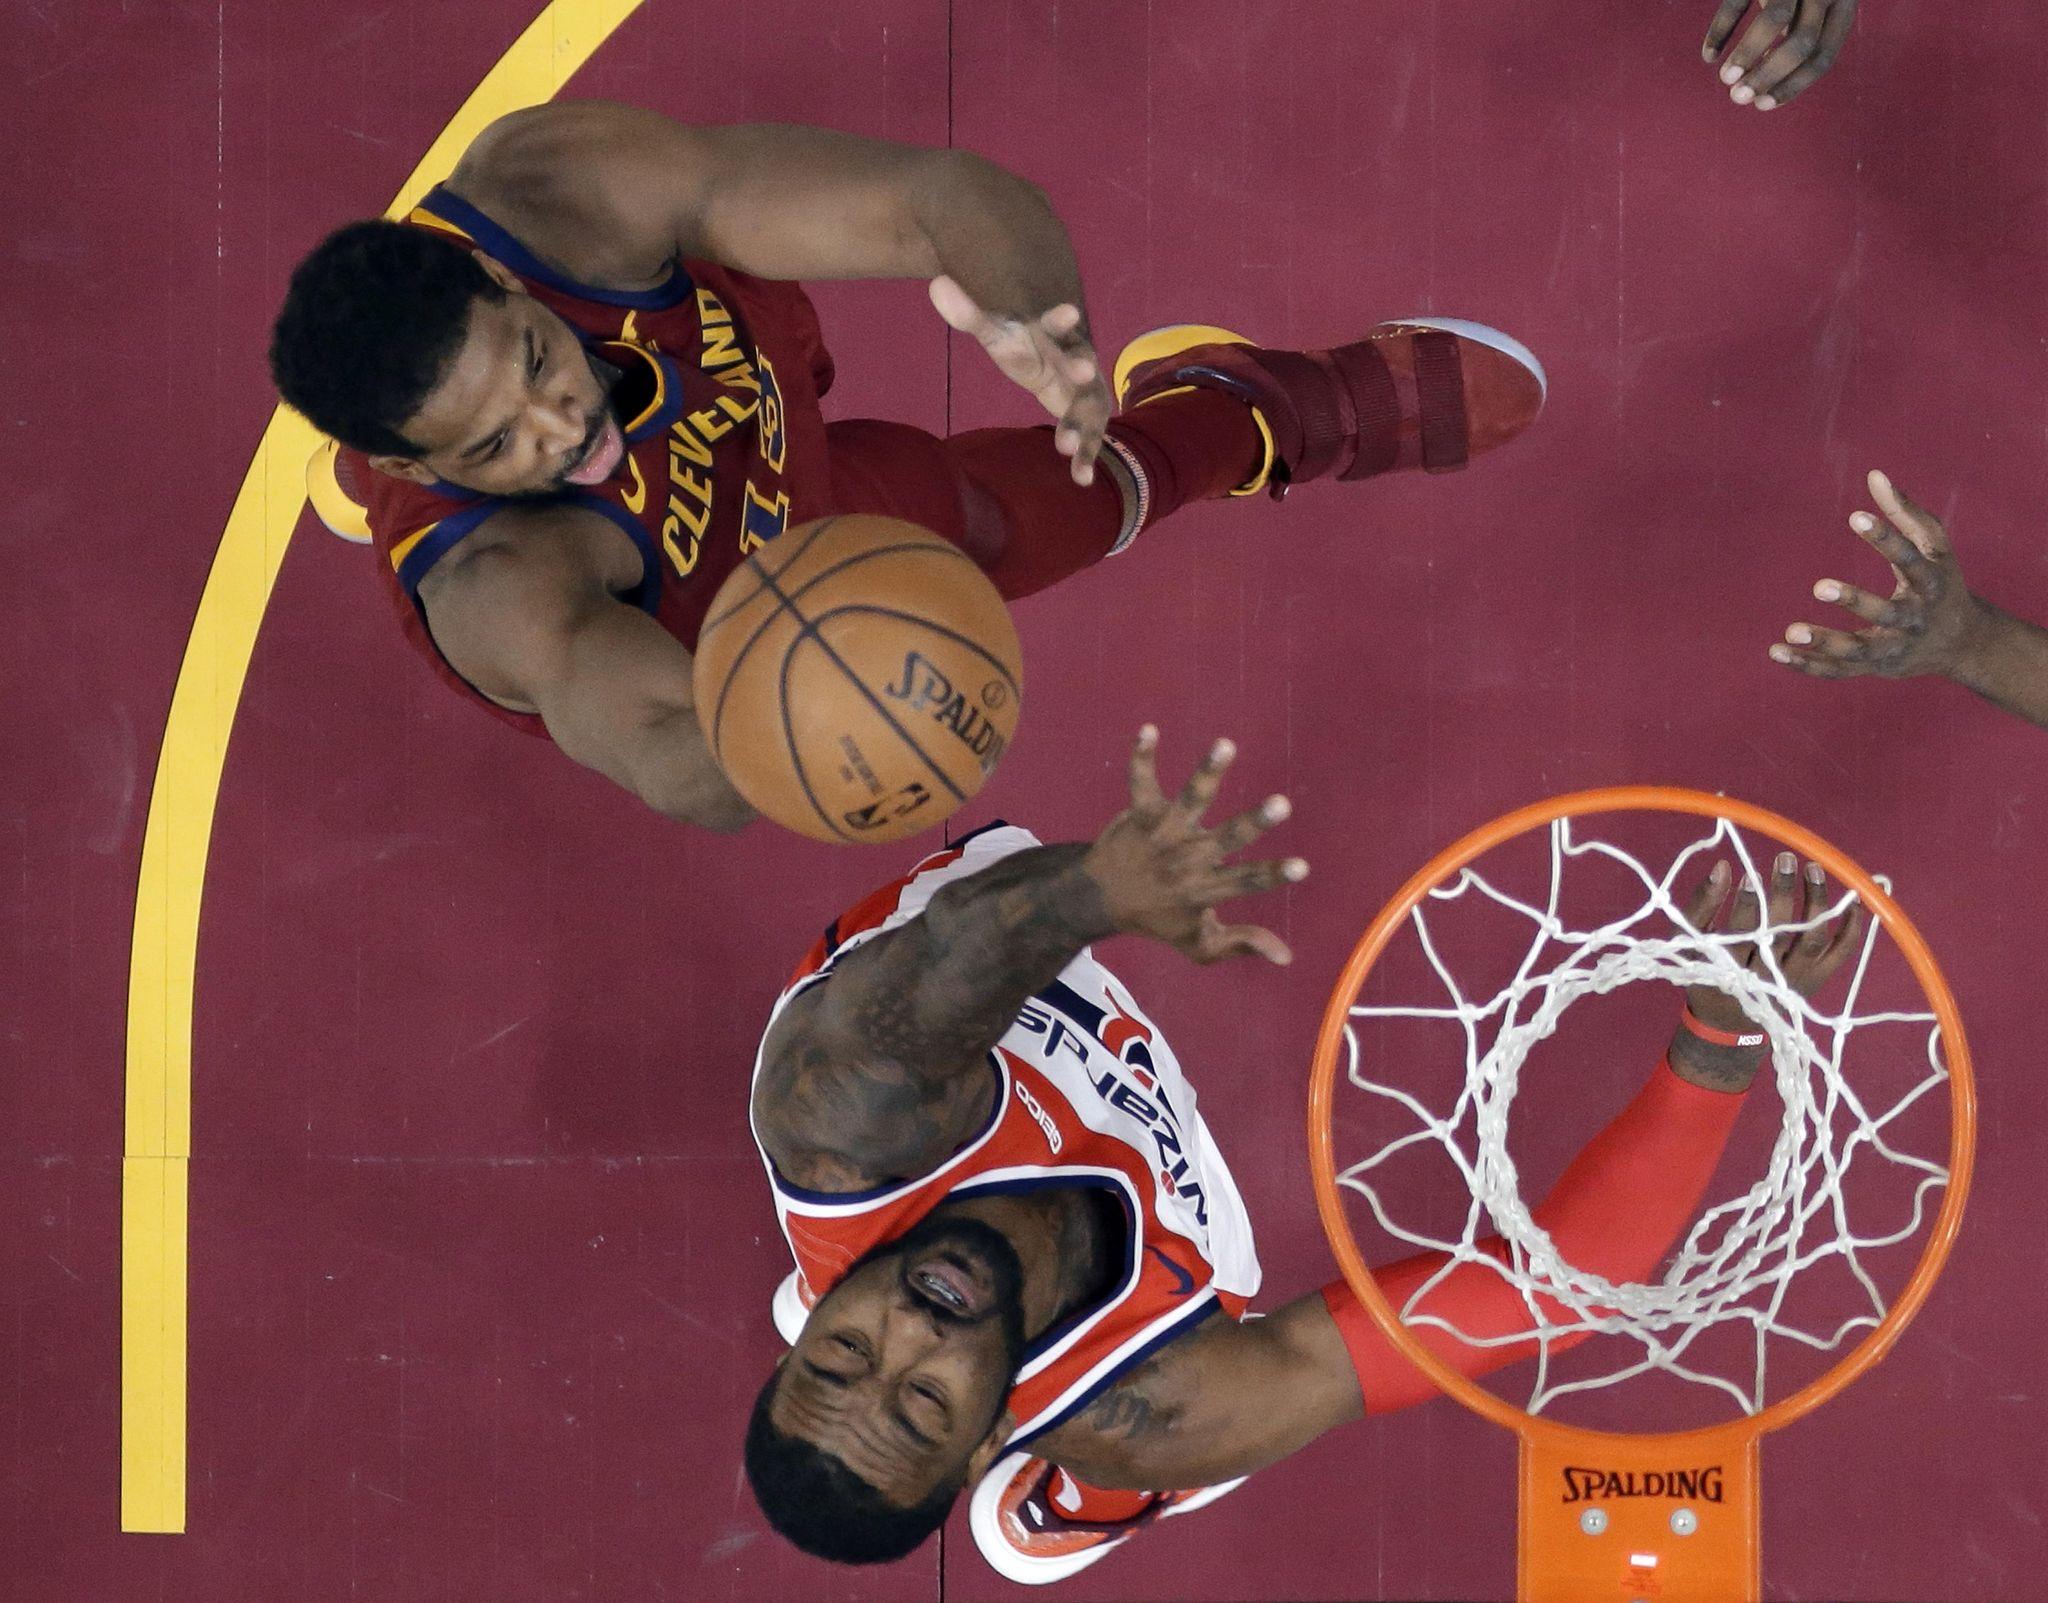 Wizards_cavaliers_basketball_21436_s2048x1603